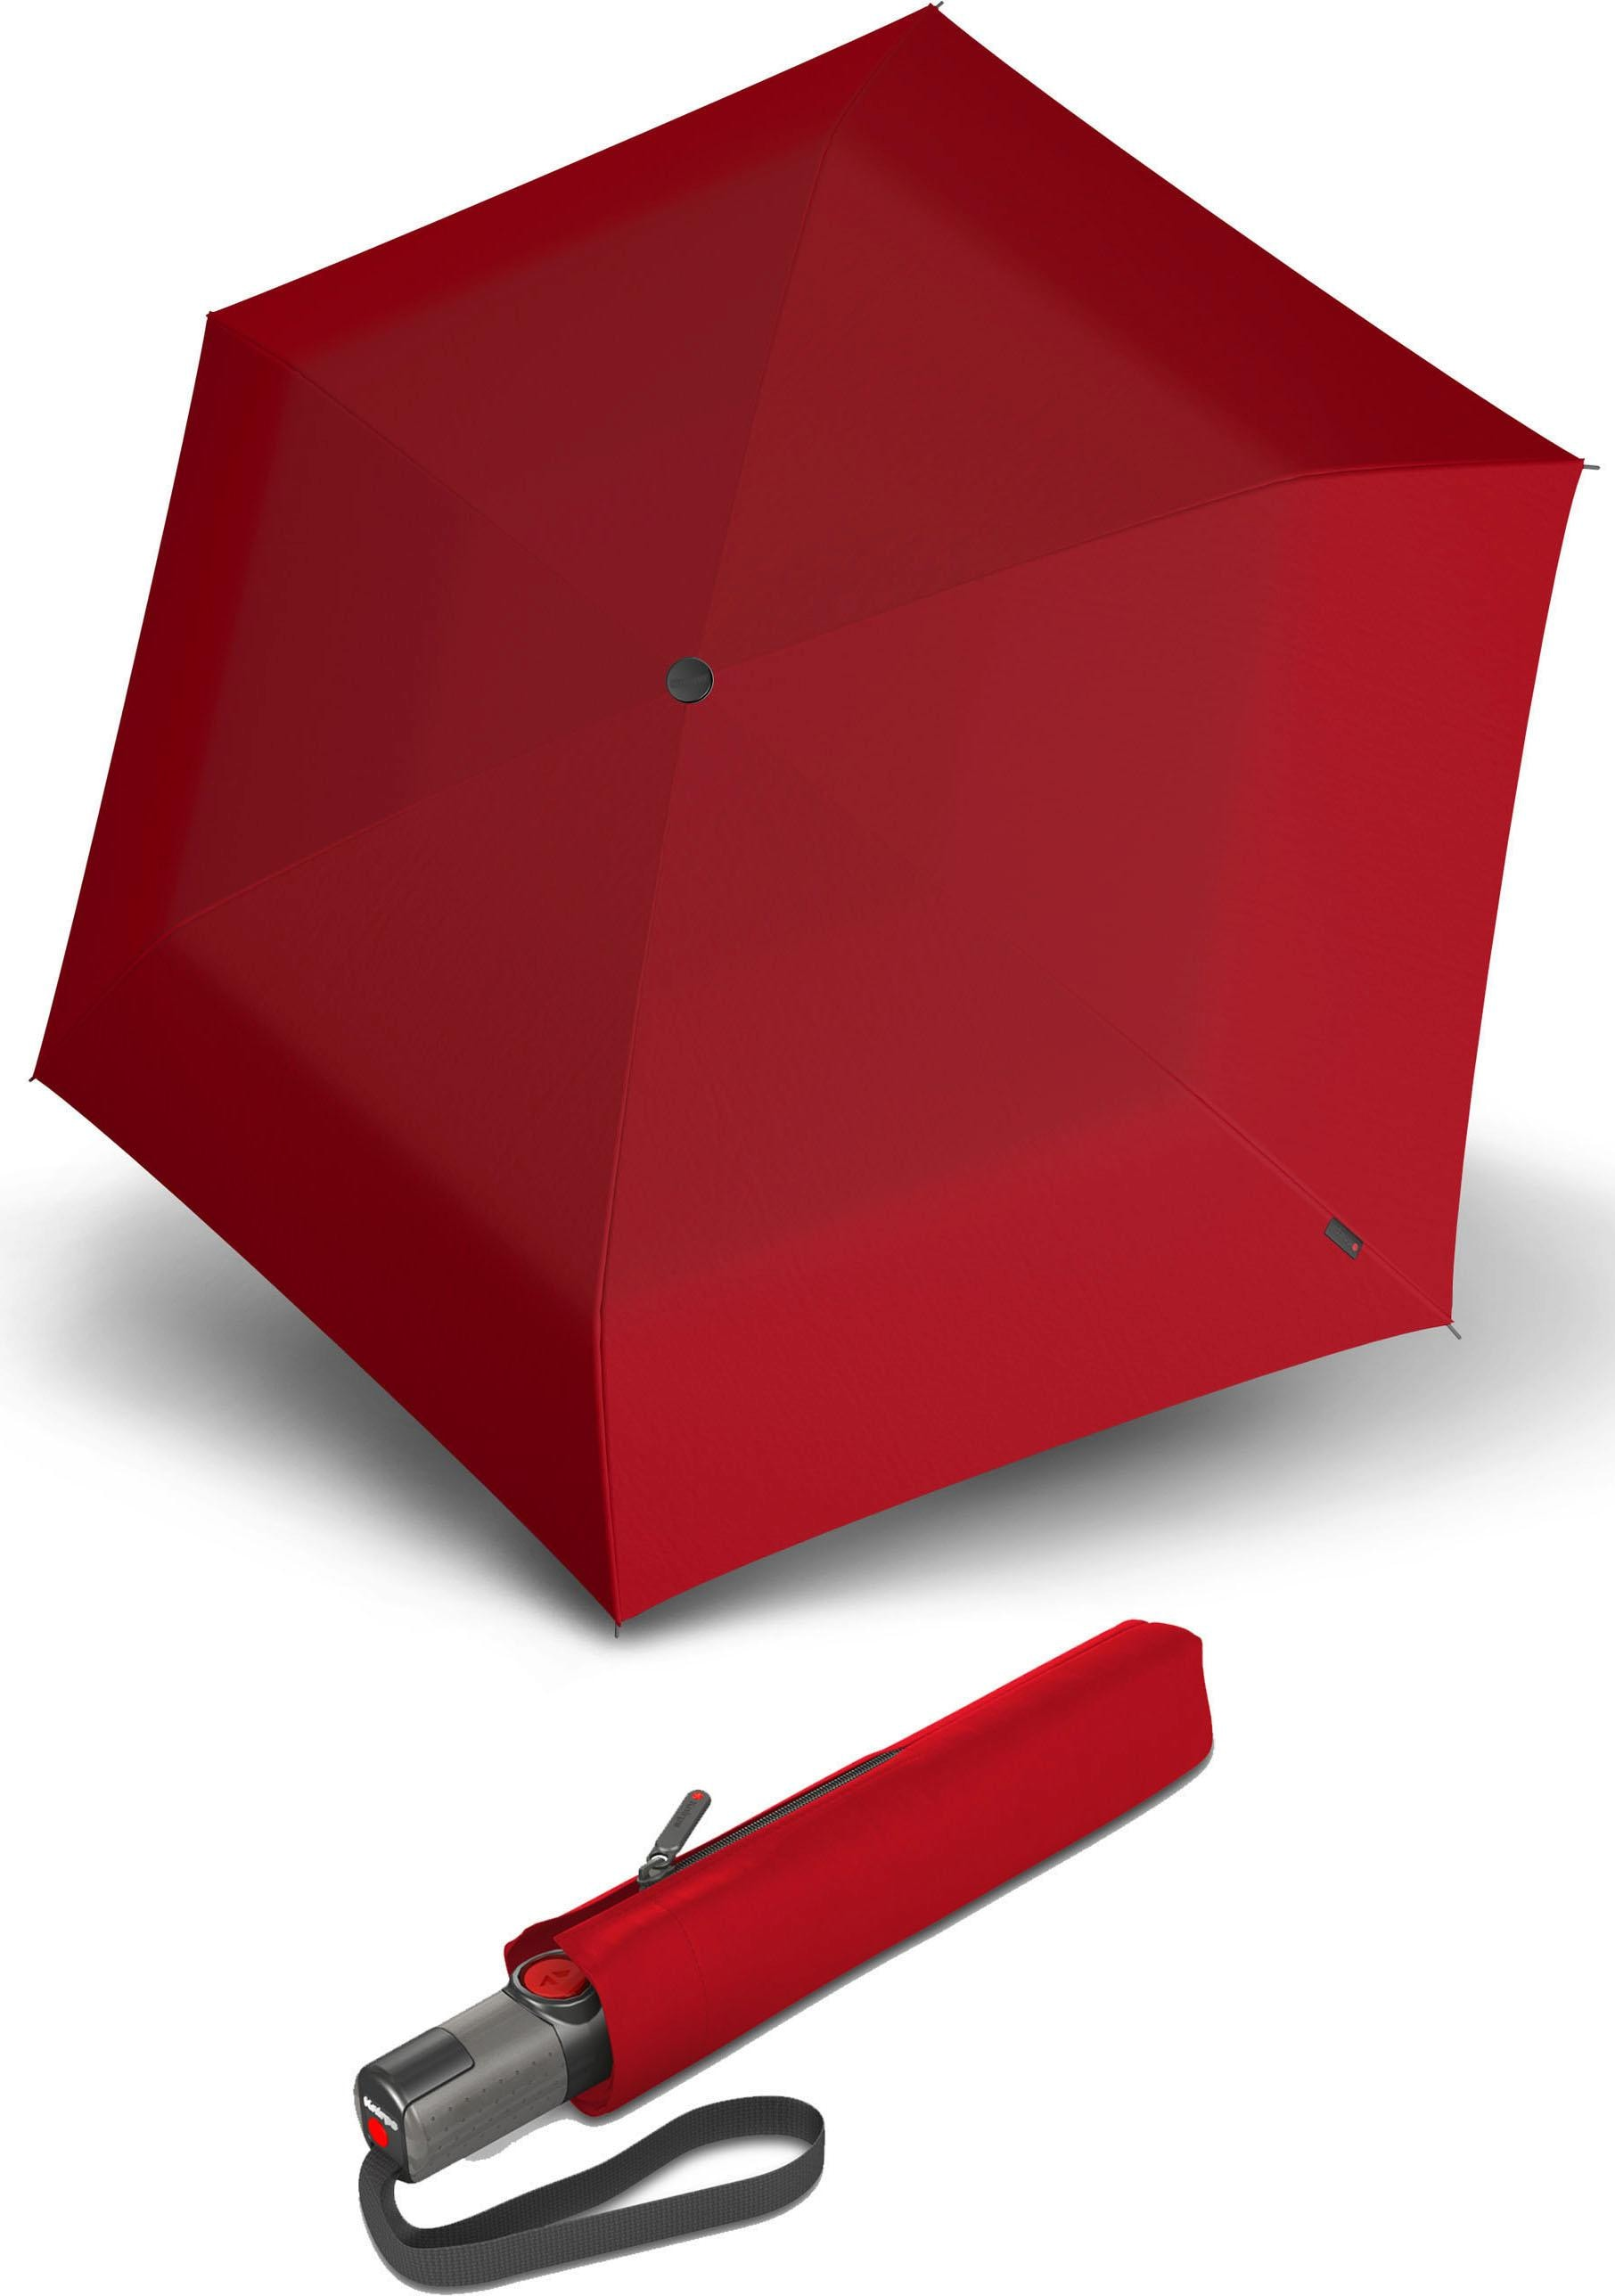 Knirps® Regenschirm - Taschenschirm, »TS.200 Slim Medium Duomatic red«   Accessoires > Regenschirme > Taschenschirme   Rot   Wo   KNIRPS